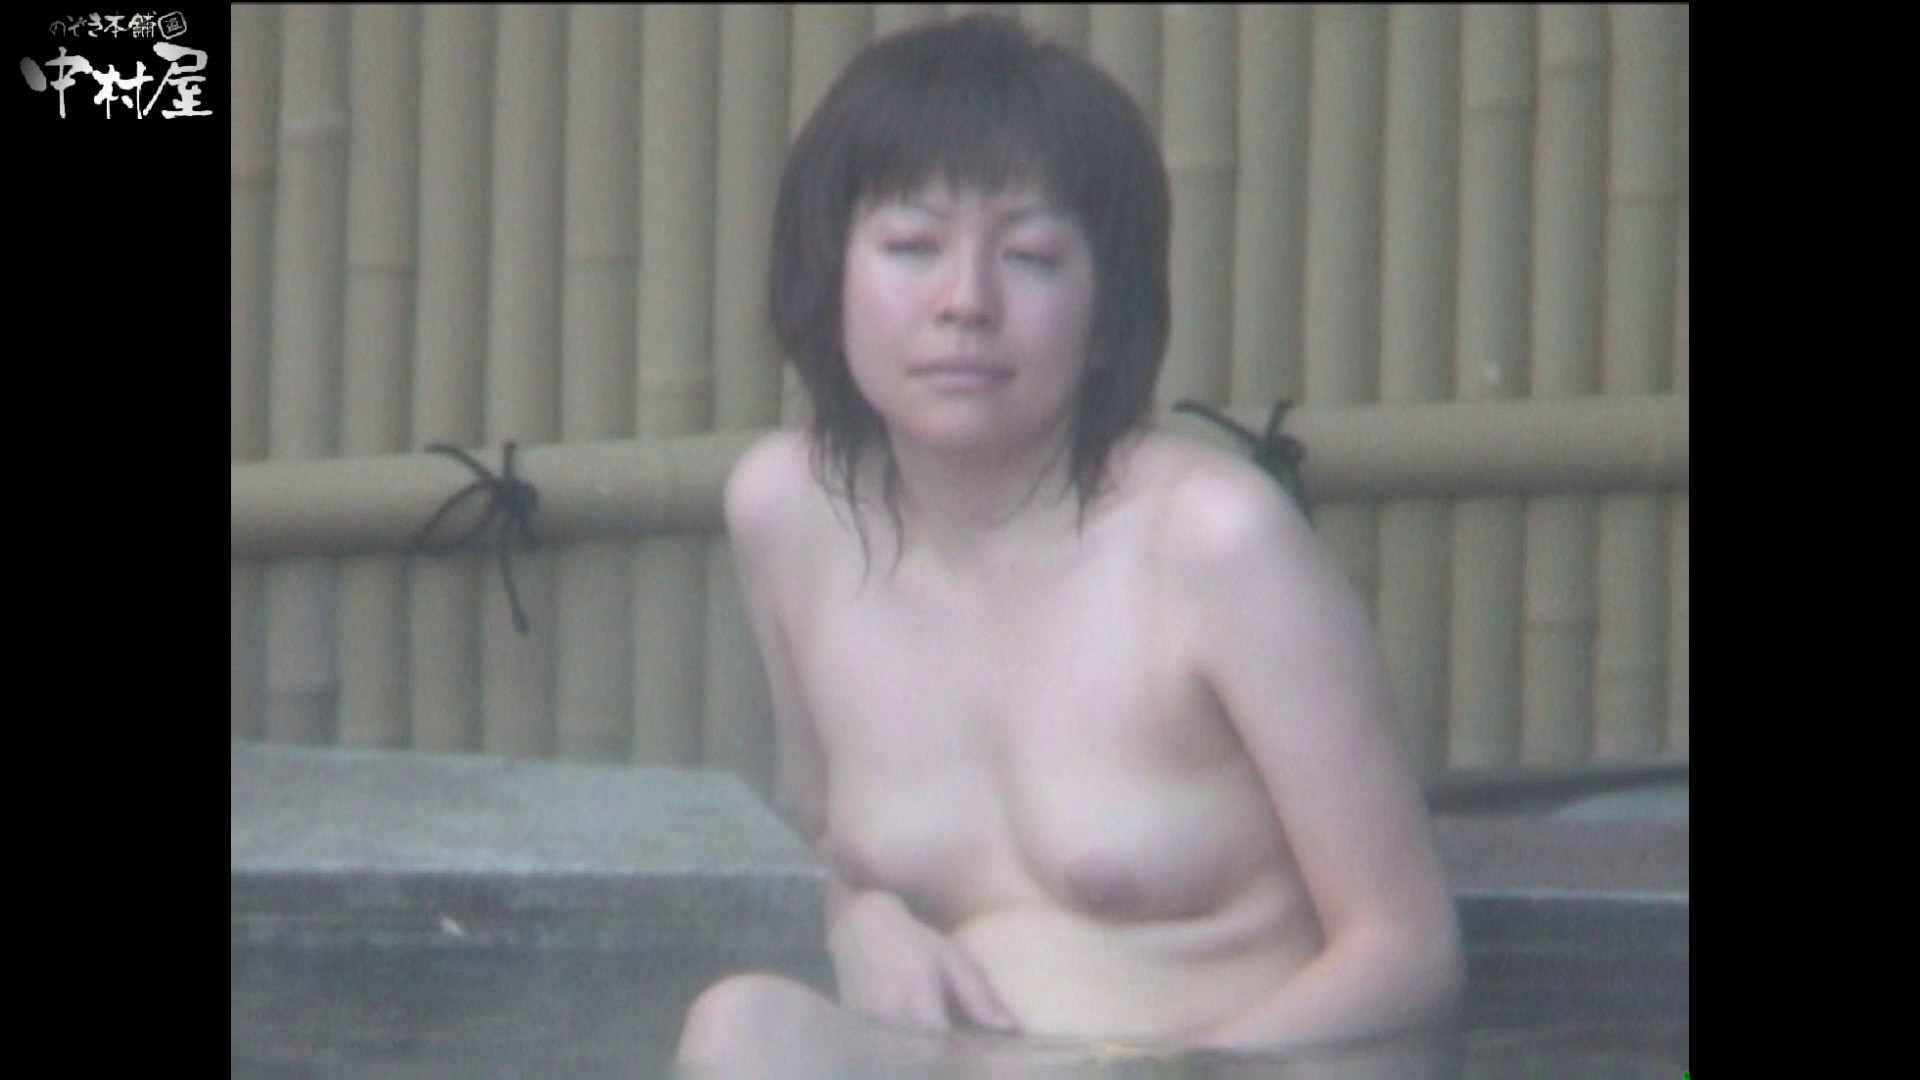 Aquaな露天風呂Vol.985 OLセックス | 露天  50画像 4